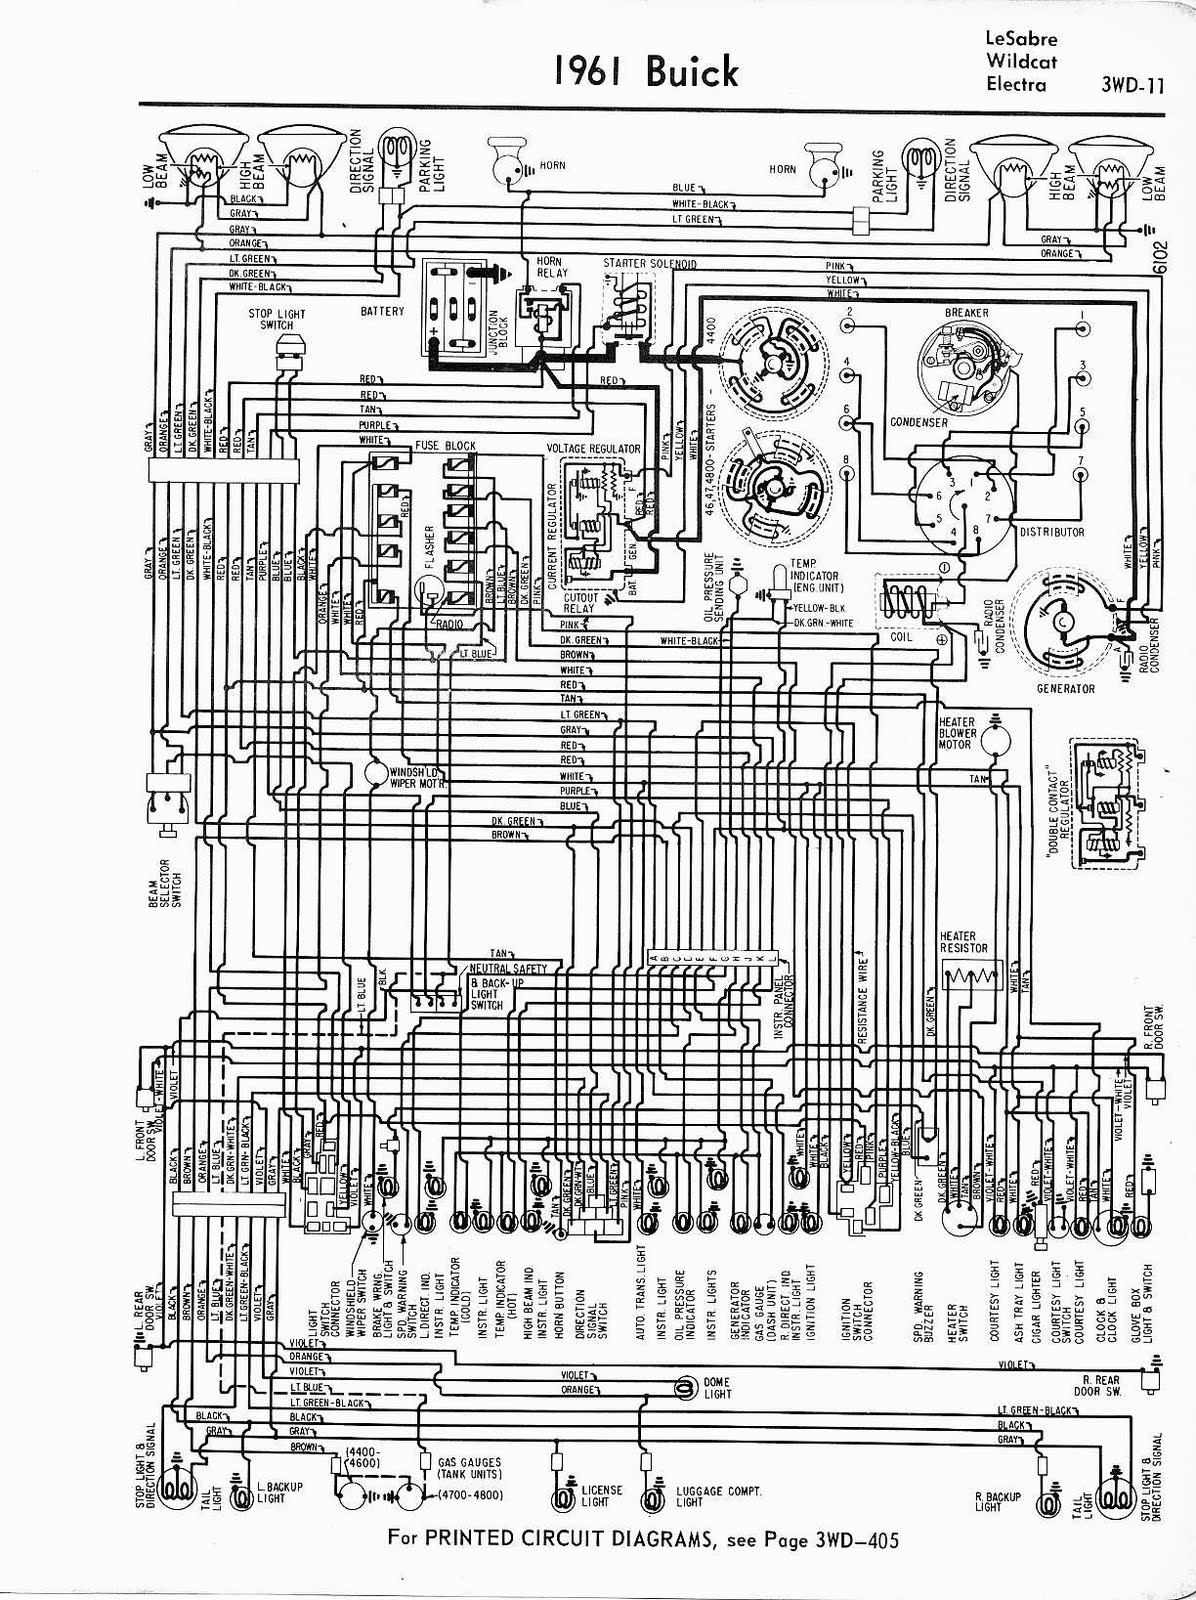 92 Dodge Truck Radio Wiring Diagram Free Auto Wiring Diagram 1961 Buick Lesabre Wildcat